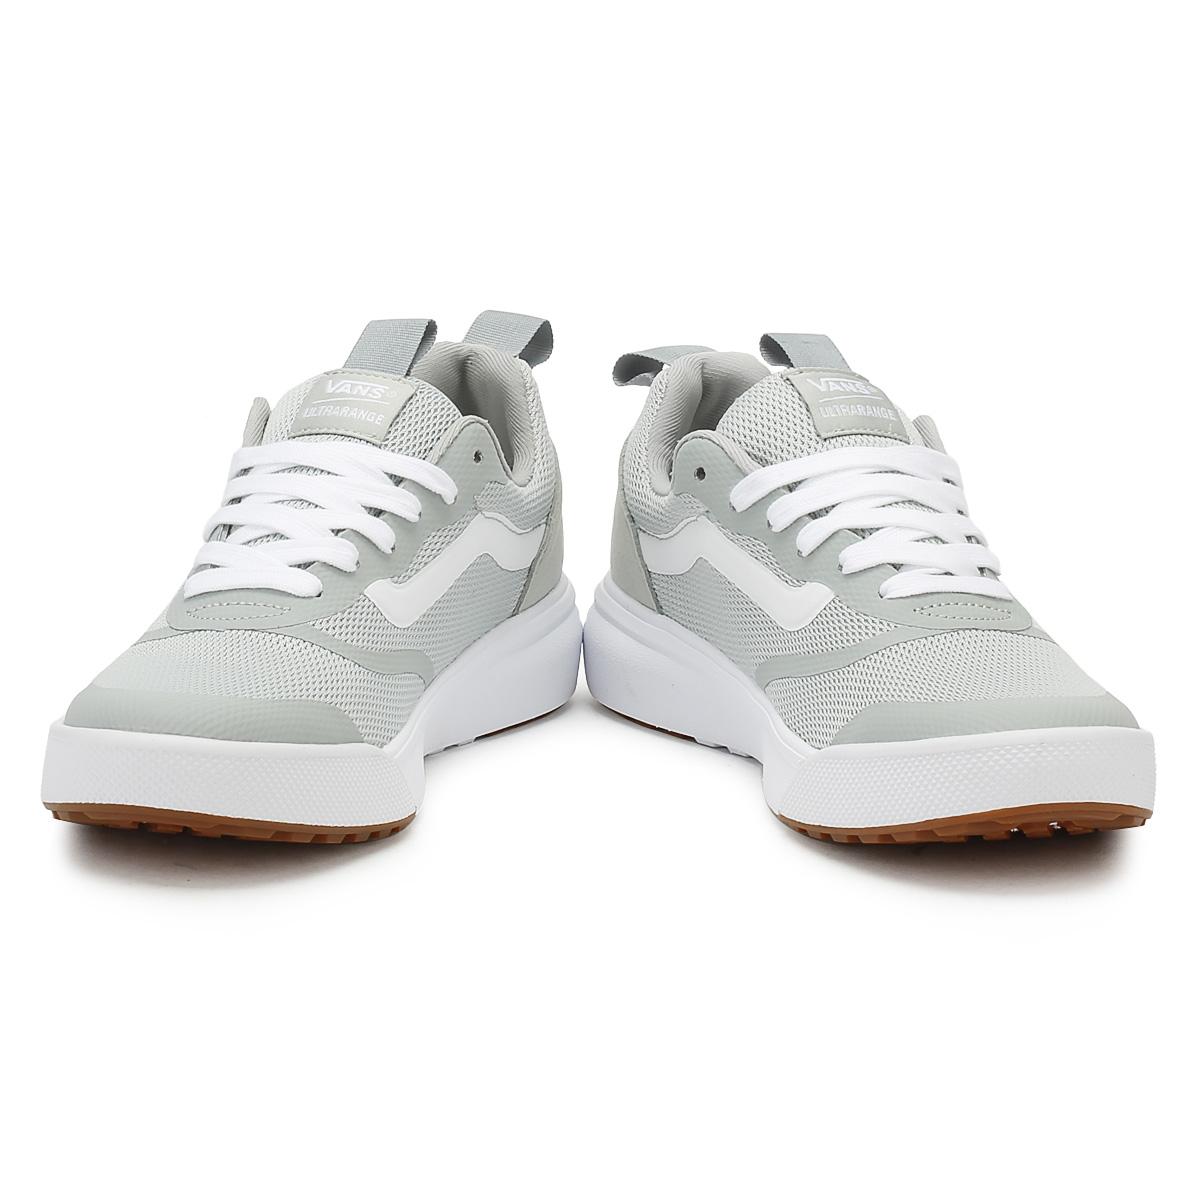 Vans Womens Metal Aqua Ultrarange Trainers Lace Up Sport Casual Shoes 604950f1e